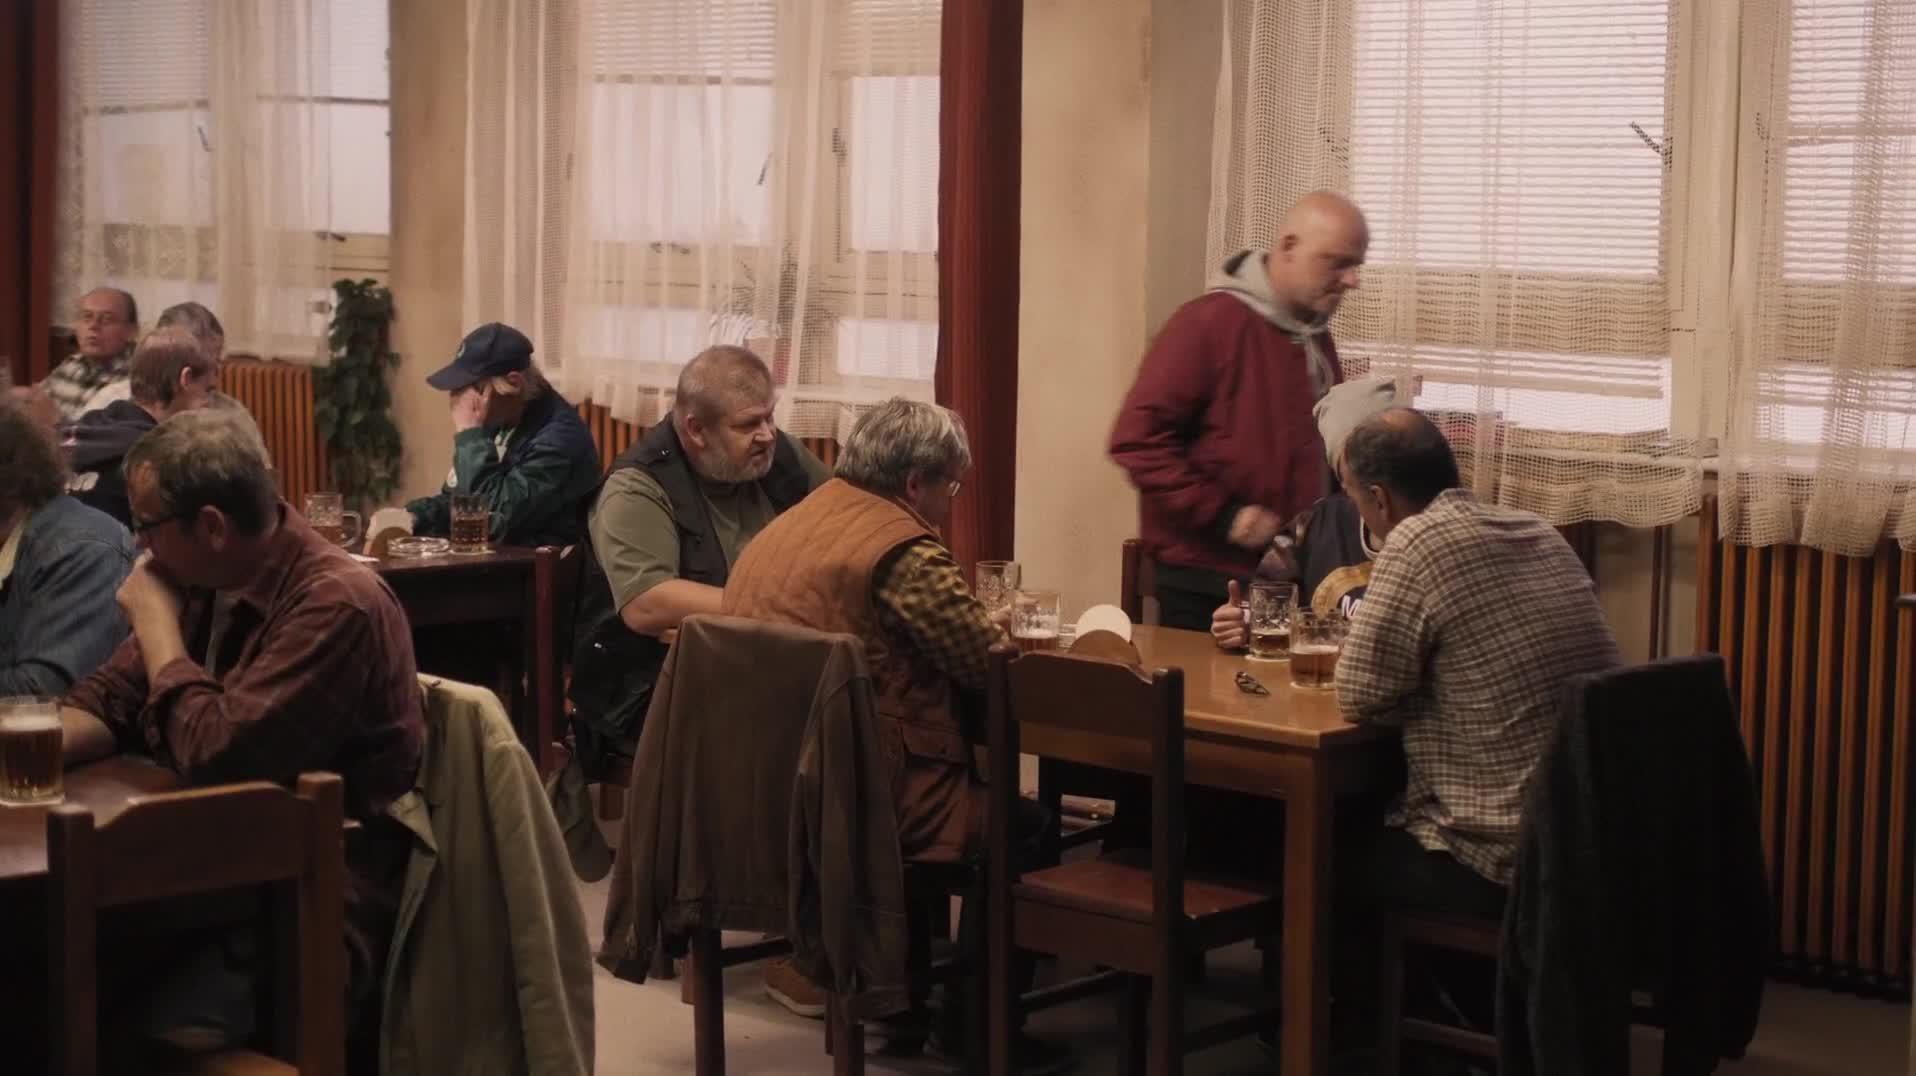 Narodni trida 2019 CZ film HD 1080p